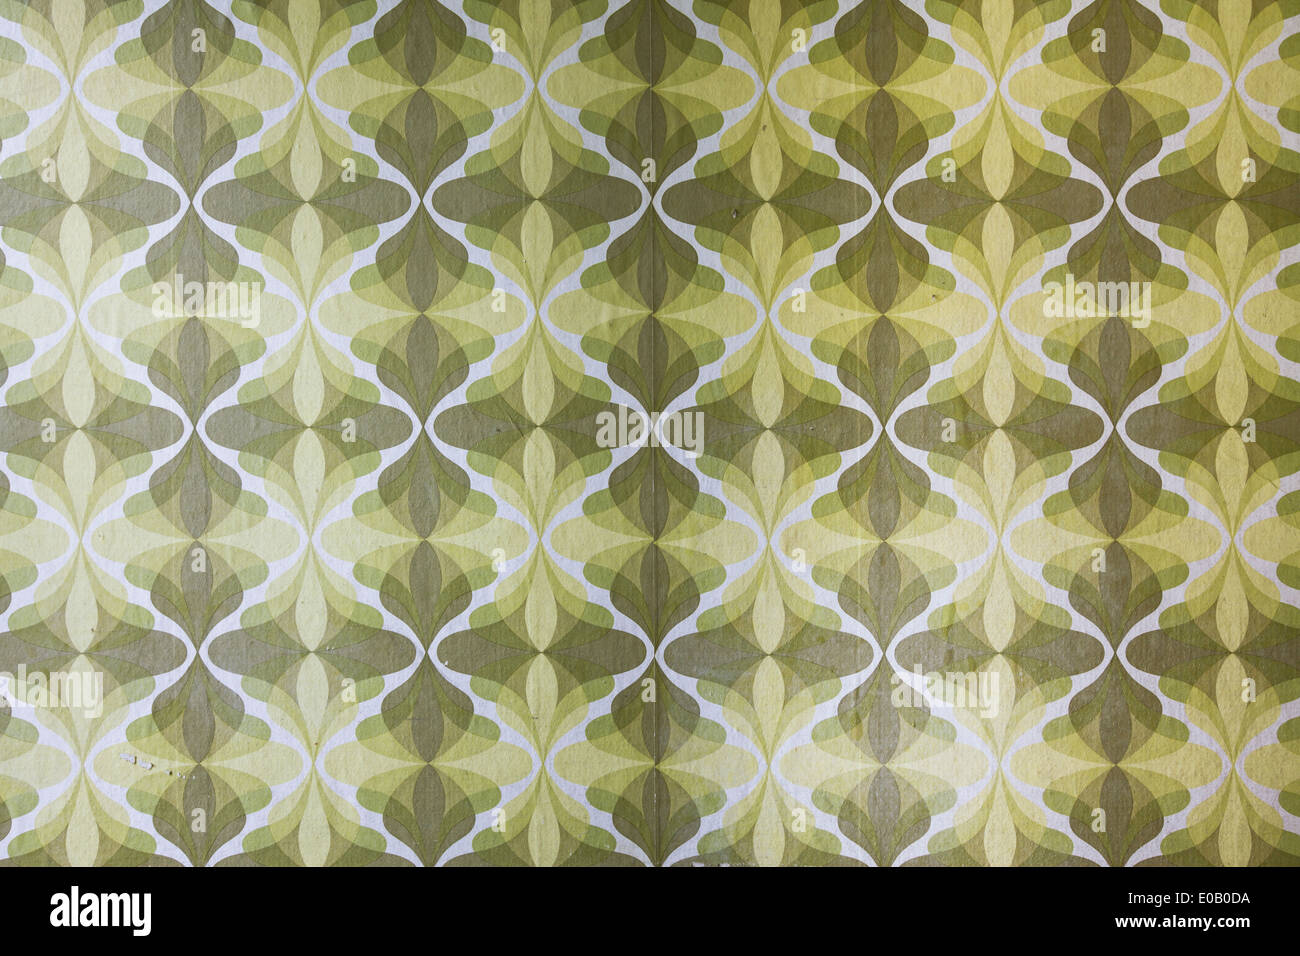 Germany, green retro wallpaper pattern - Stock Image